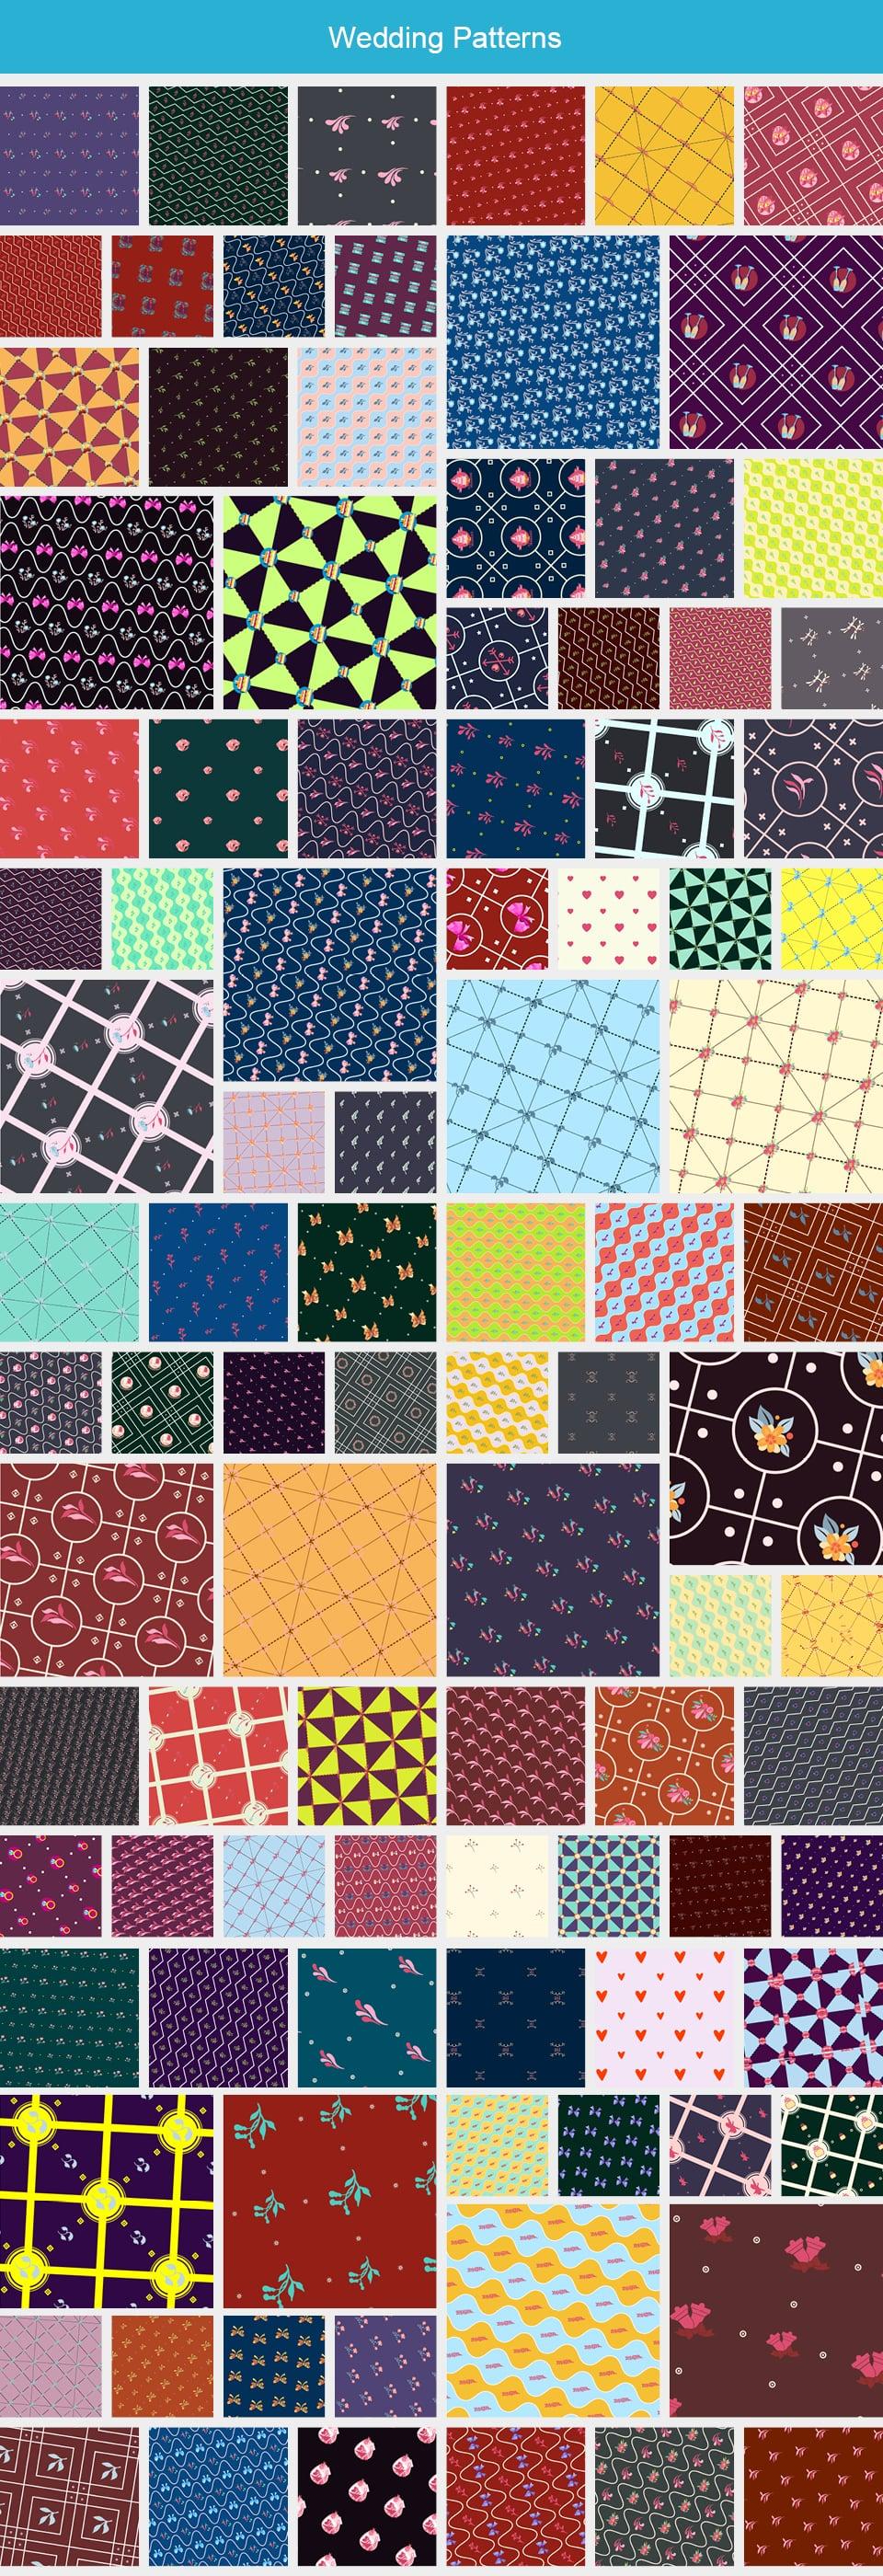 Modern Pattern Designs - Mega Bundle with 2000 Patterns - Large Preview Wedding